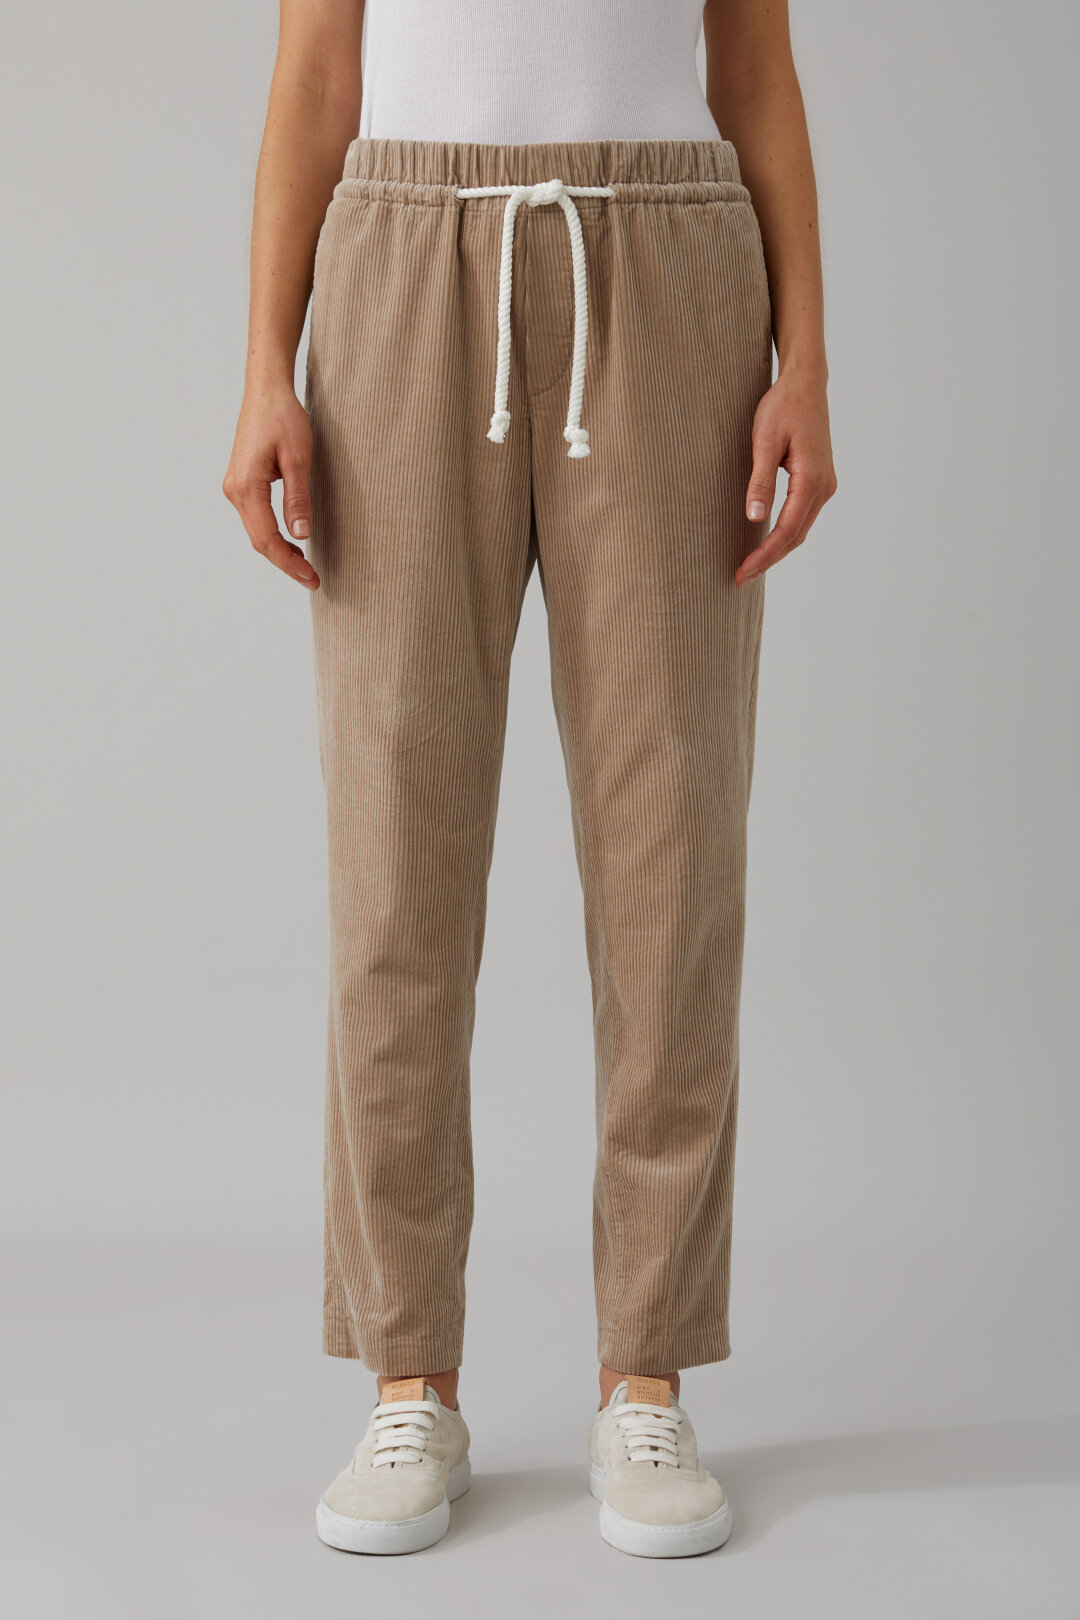 Pantalon en velours côtelé Blanch